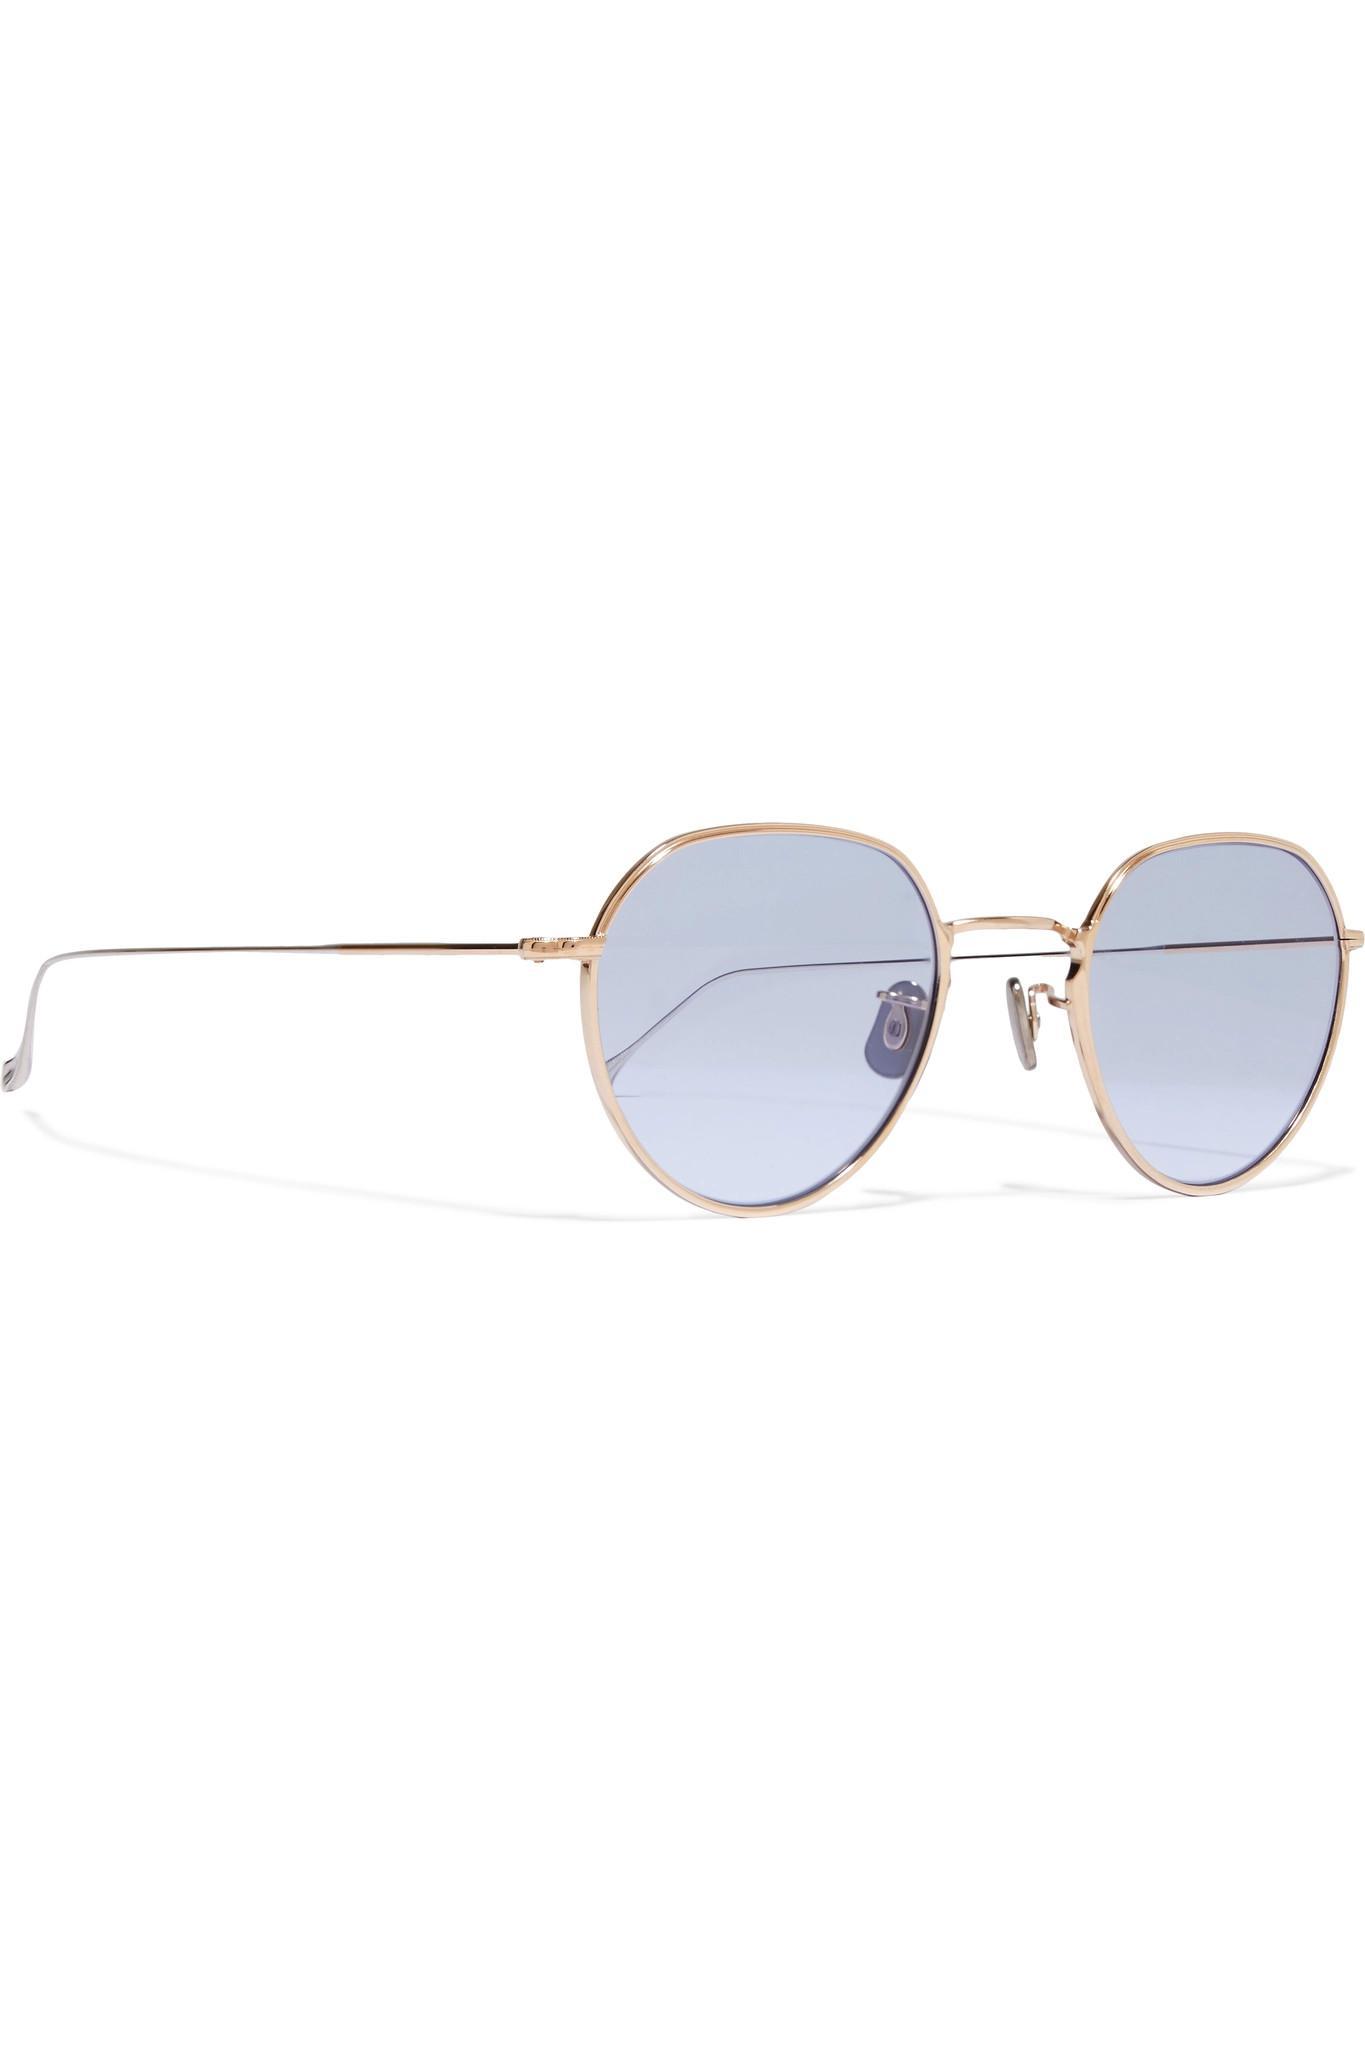 6062e333d2 Lyst - Eyevan 7285 Round-frame Gold-tone Sunglasses in Metallic